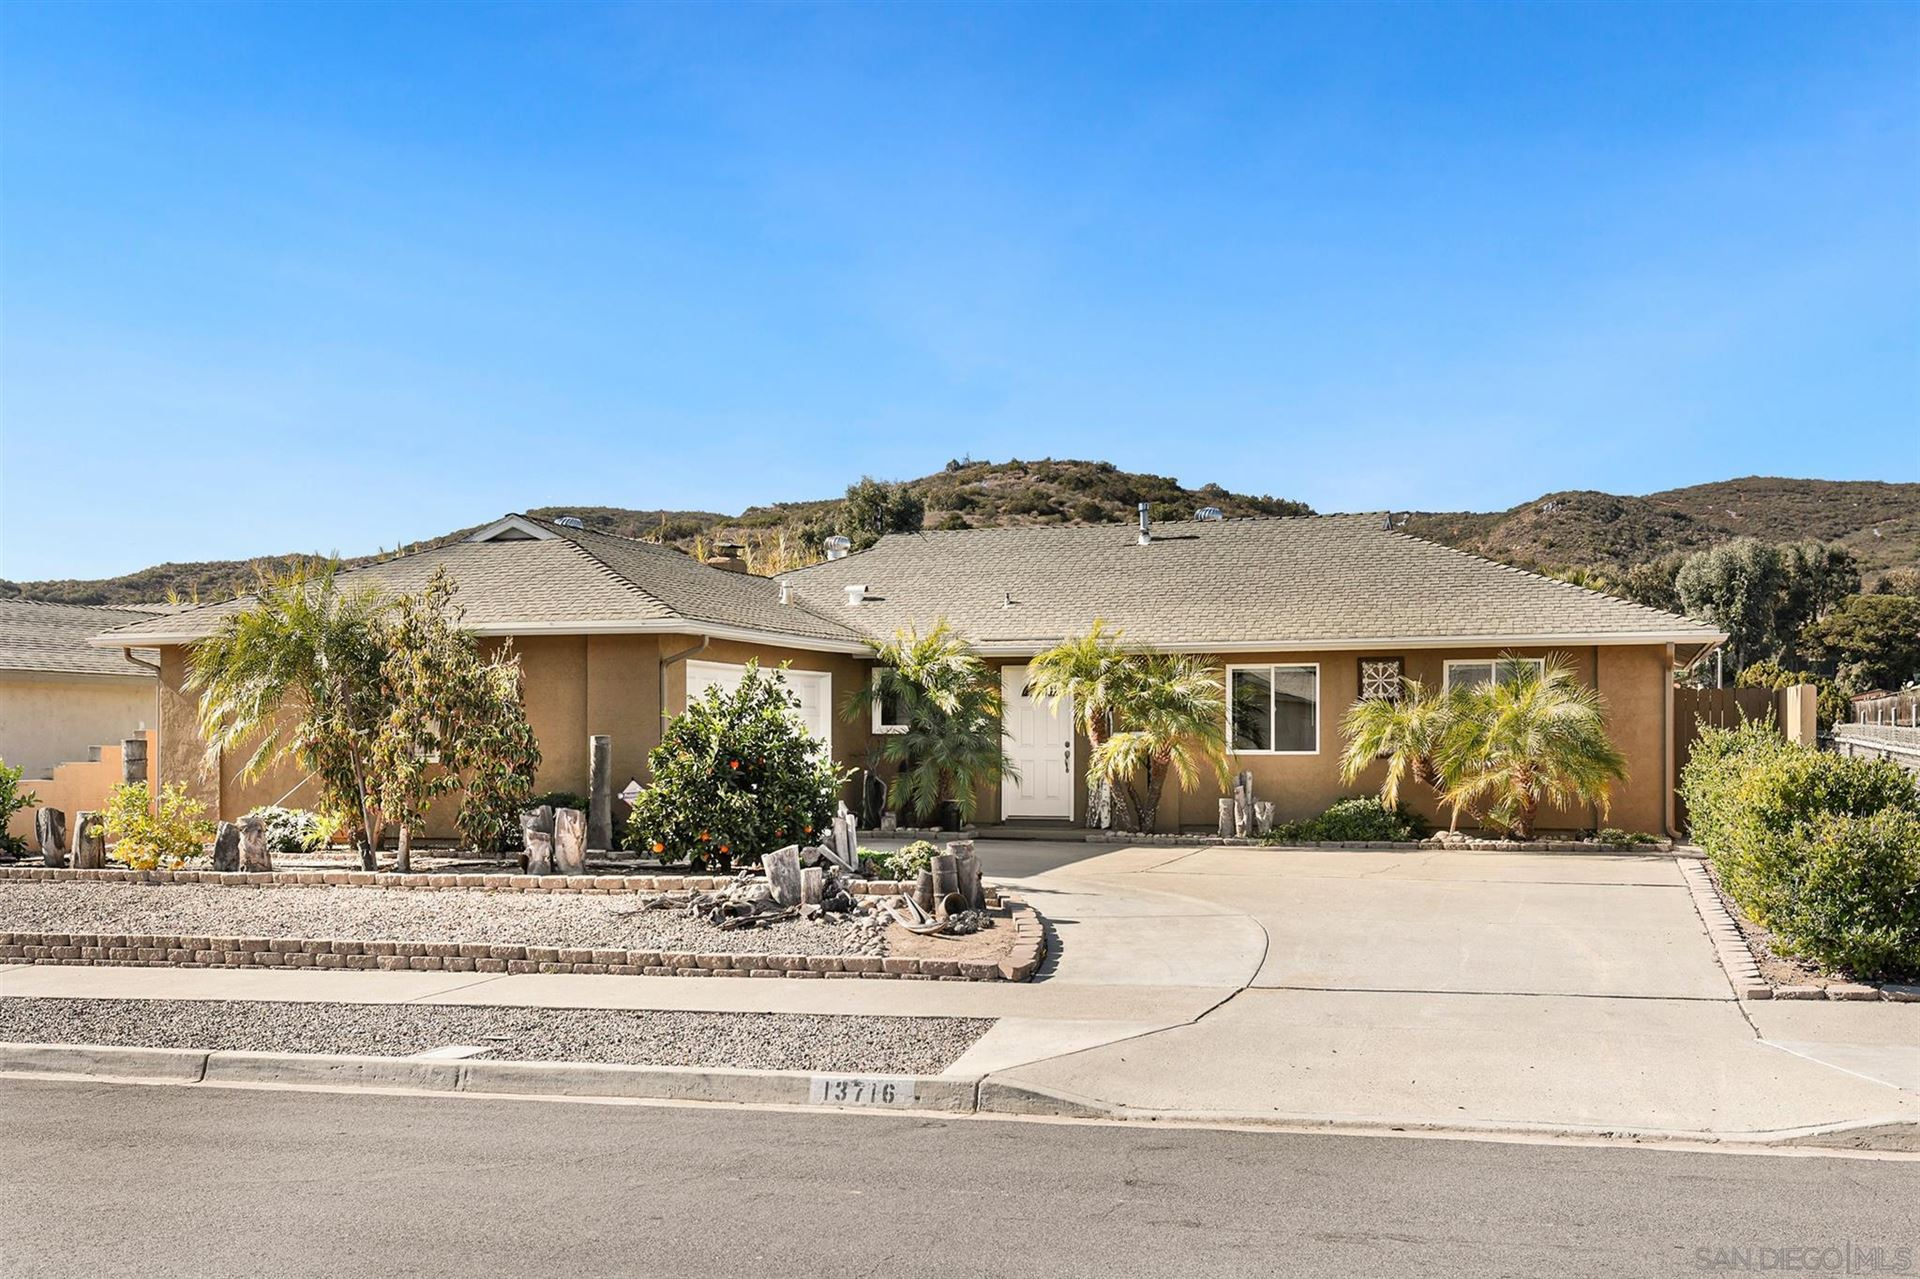 Photo of 13716 Frame Rd, Poway, CA 92064 (MLS # 210001130)